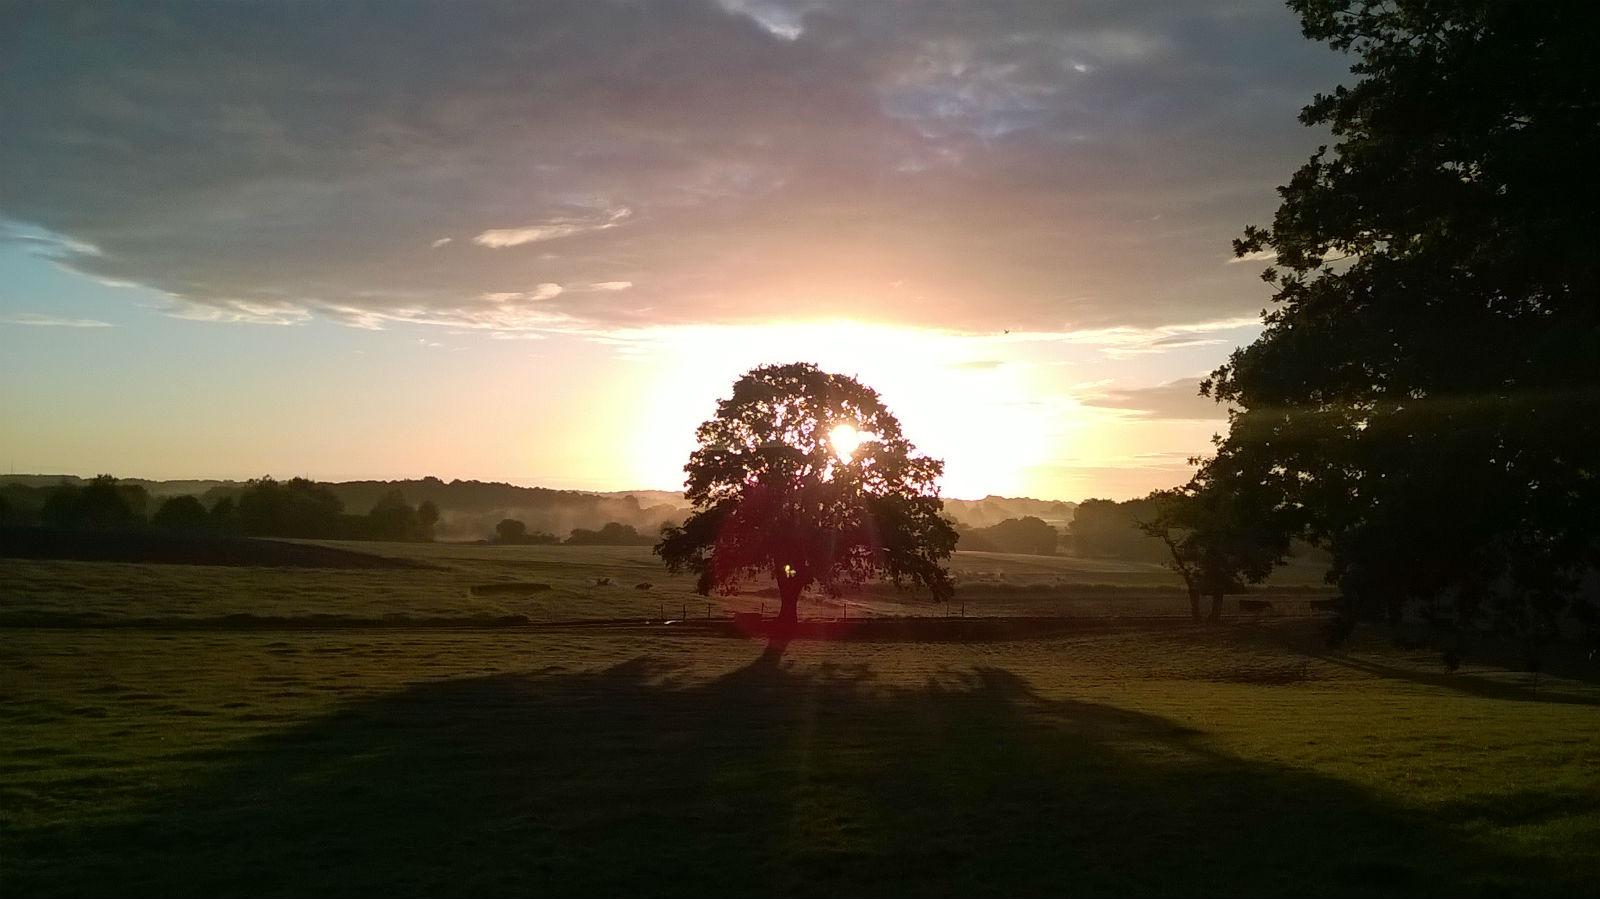 Le grand arbre de la ferme.